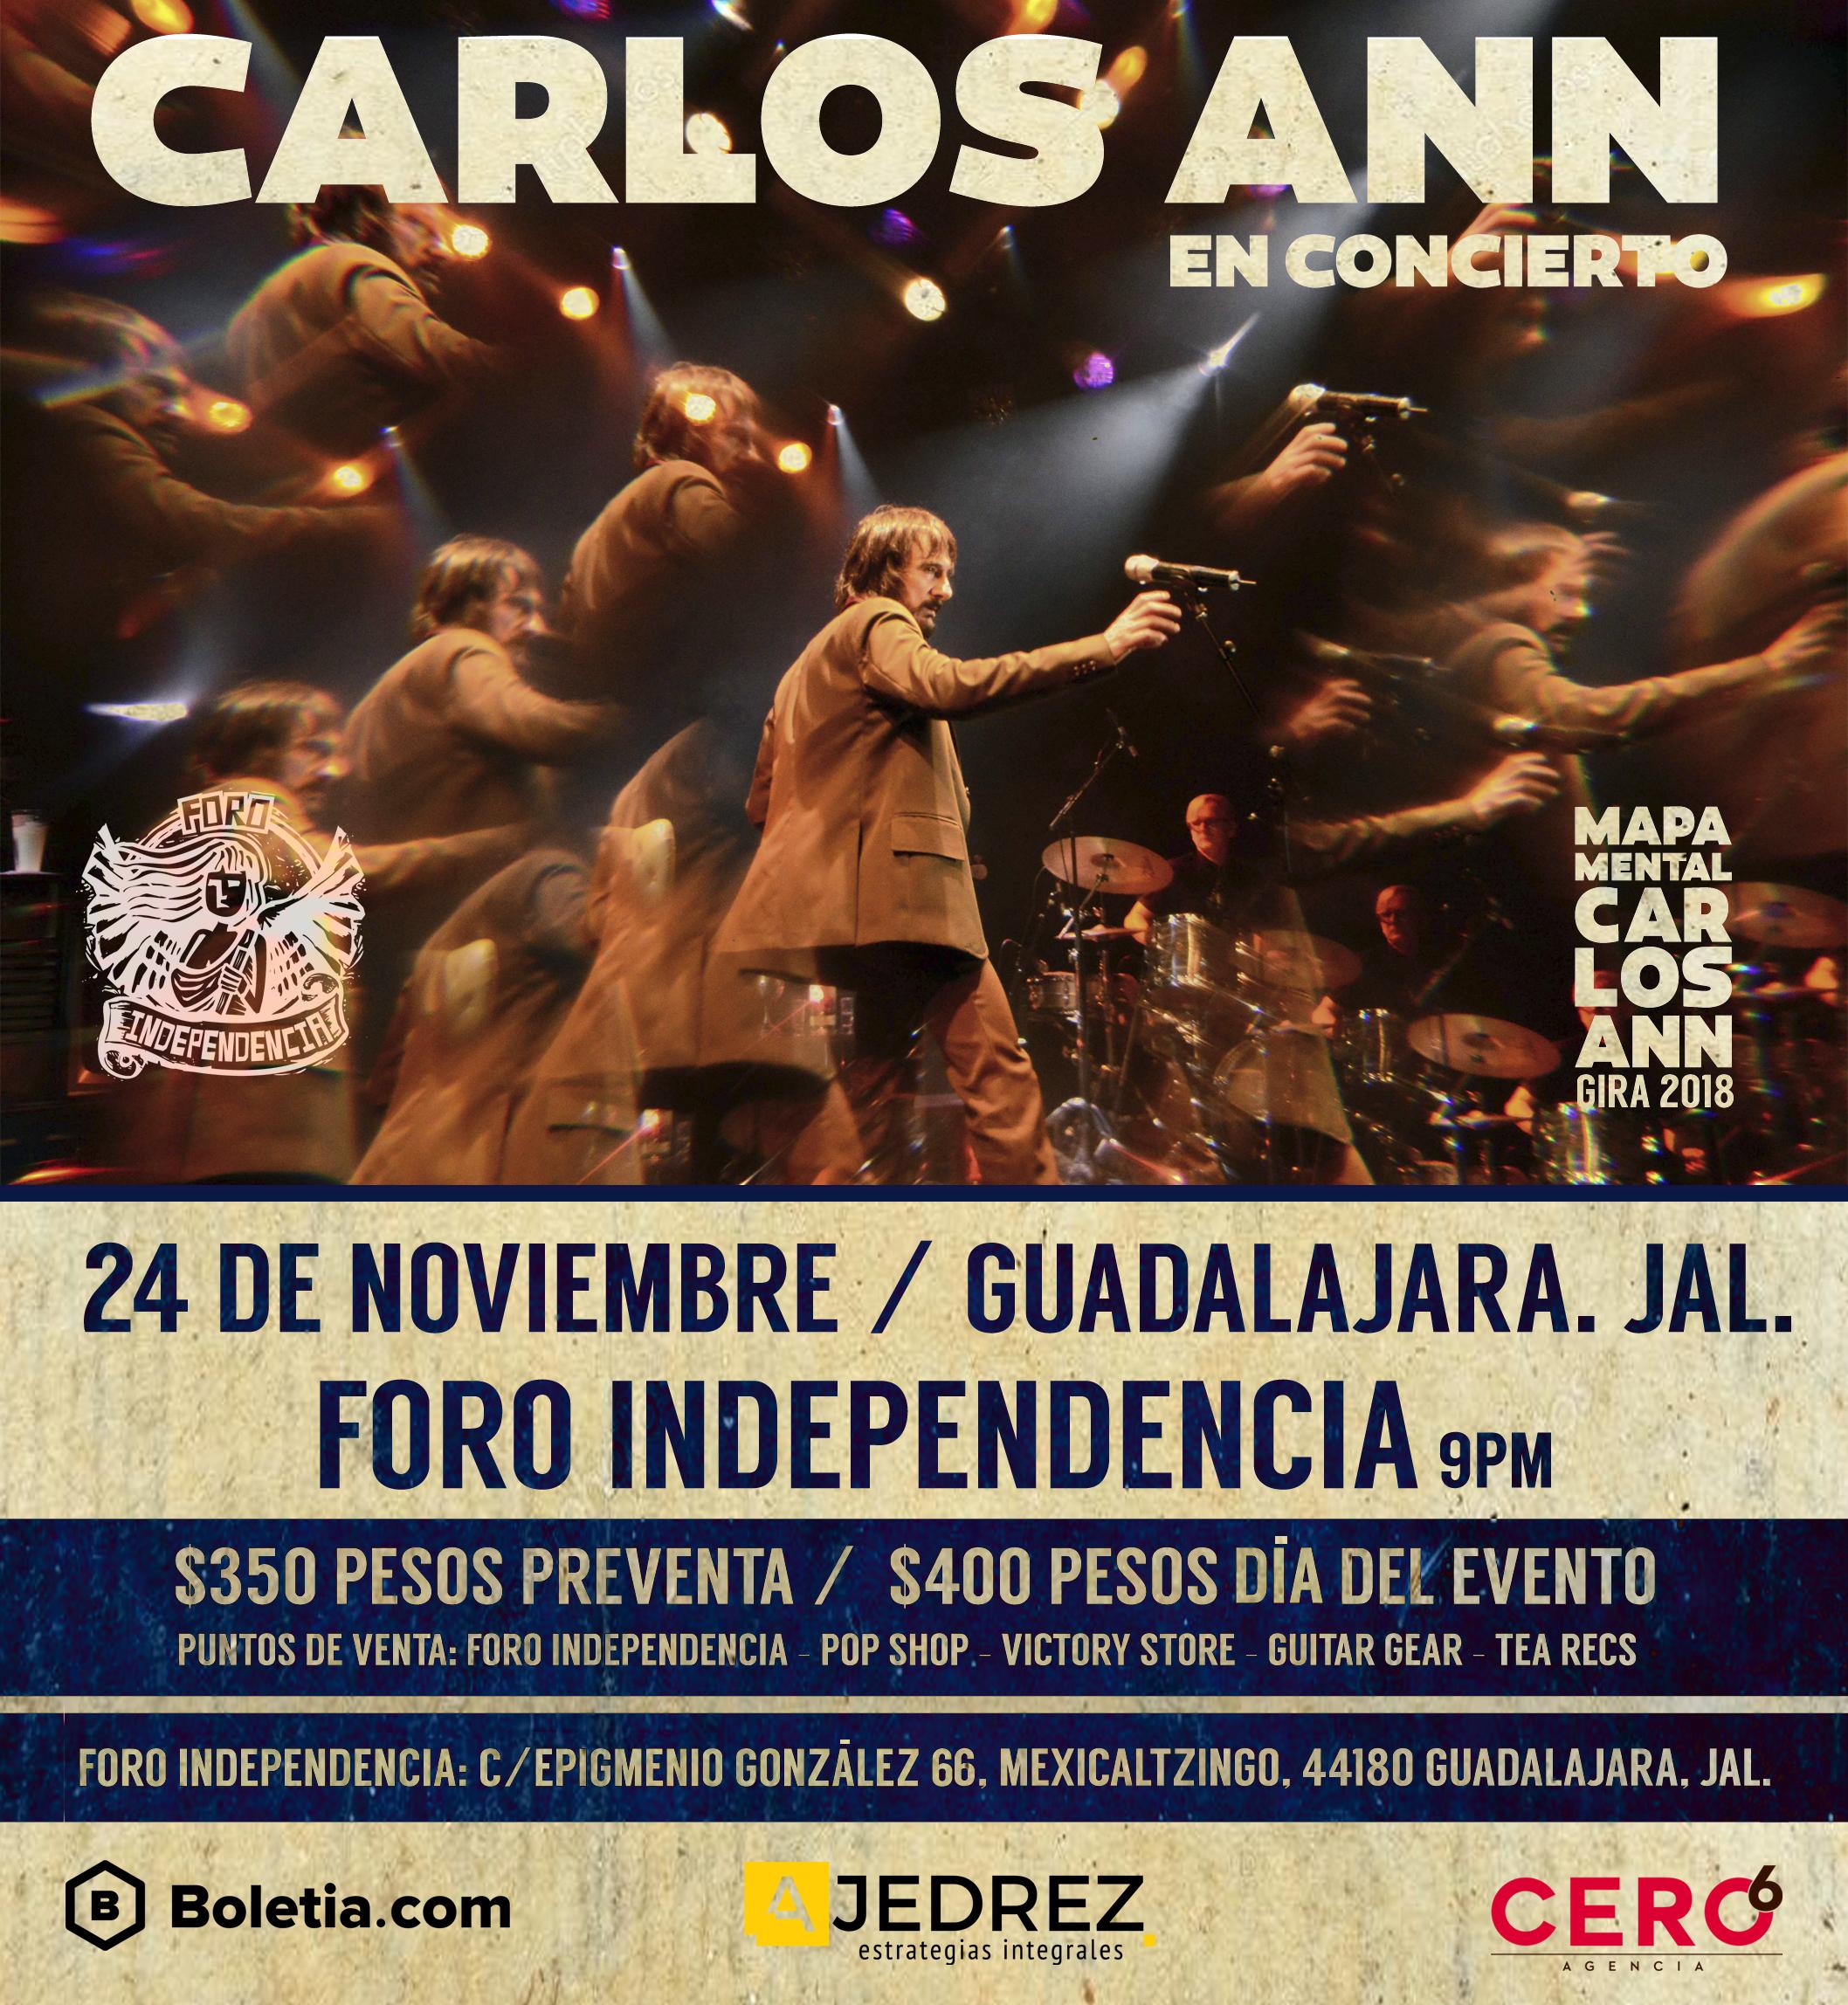 Carlos Ann / Foro Independencia